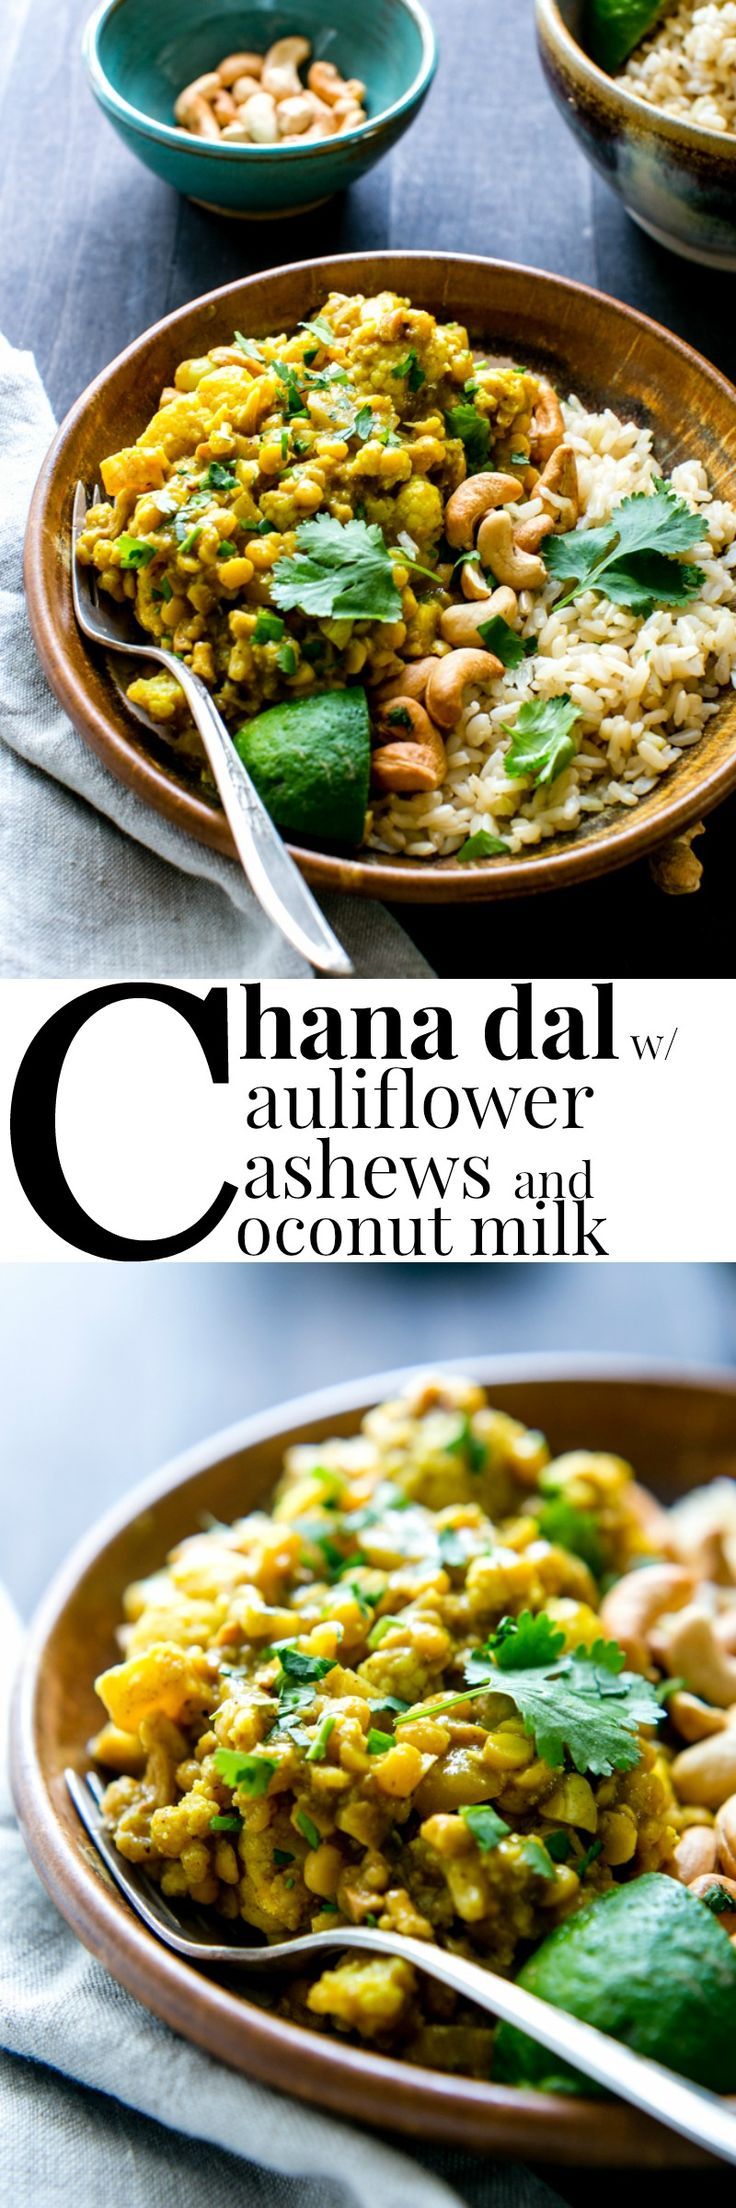 Dahl met bloemkool, cashewnoten en kokosmelk.